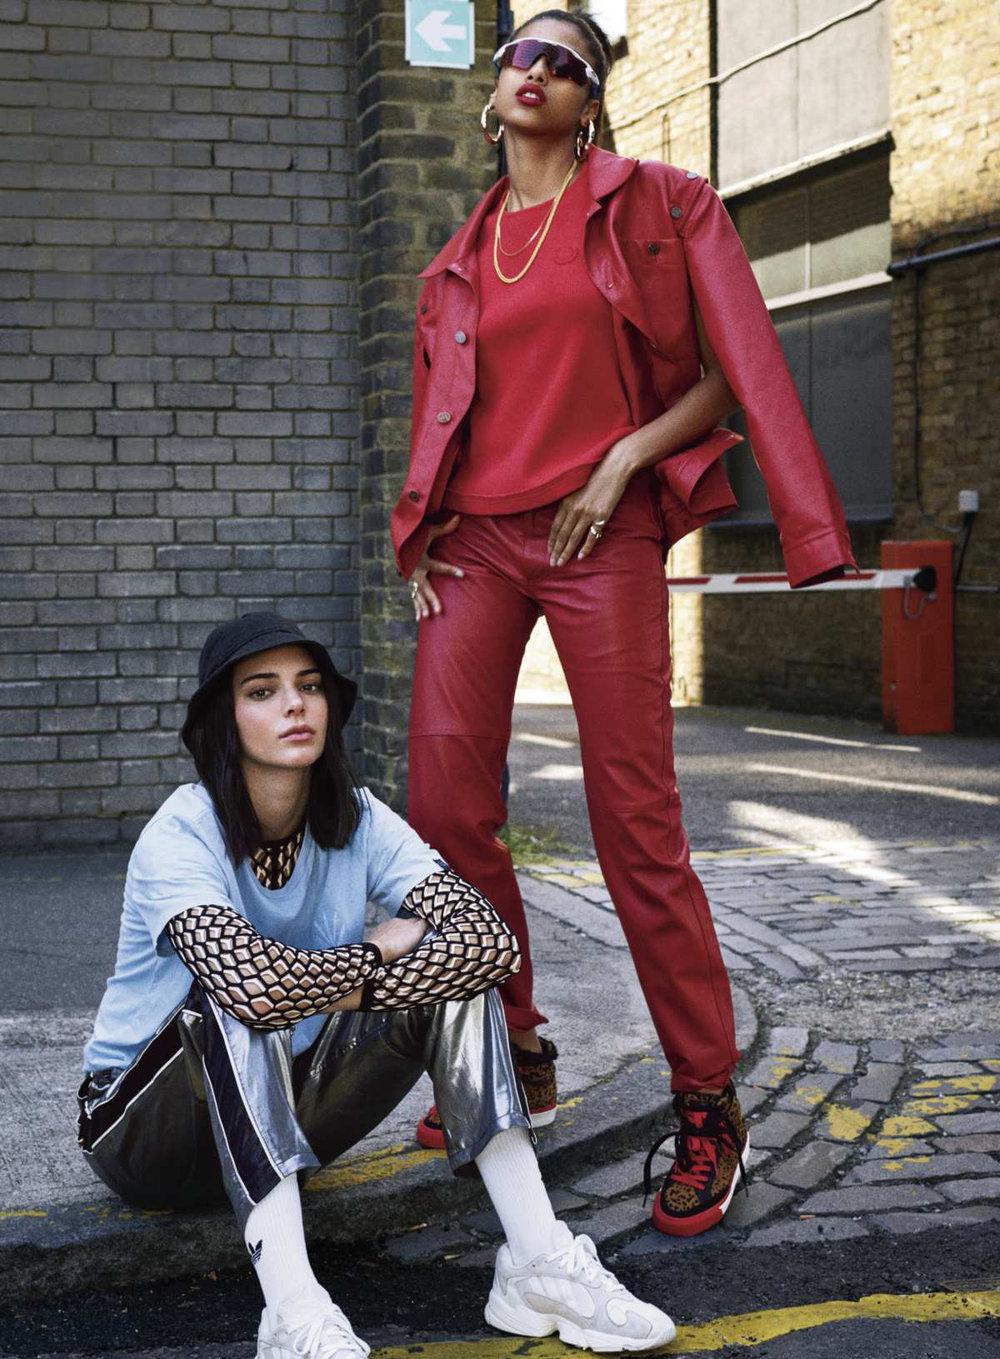 Imaan Hammam Kendall Jenner Vogue US Nov 2018-2 (5).png